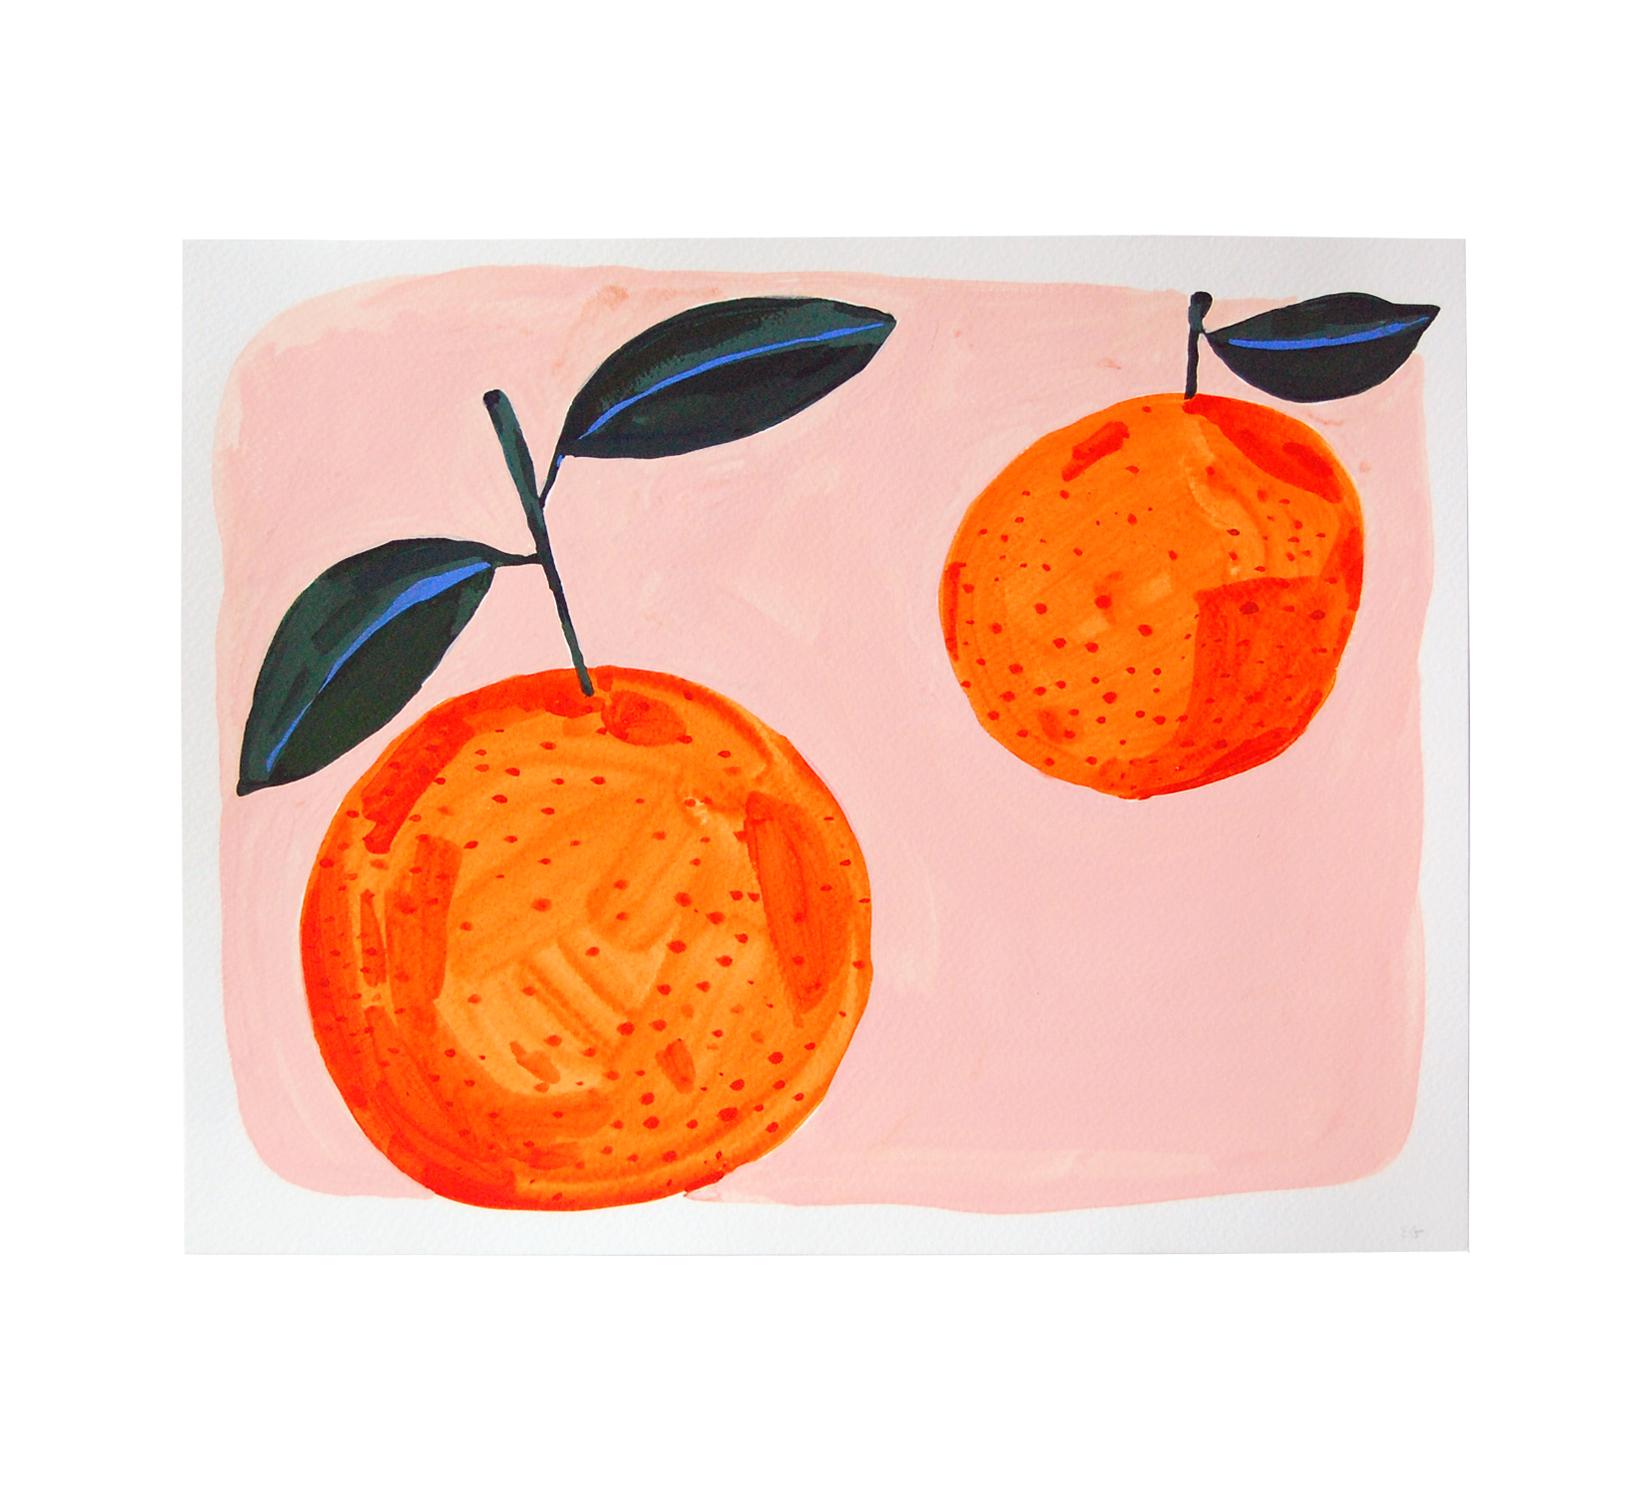 Two Oranges